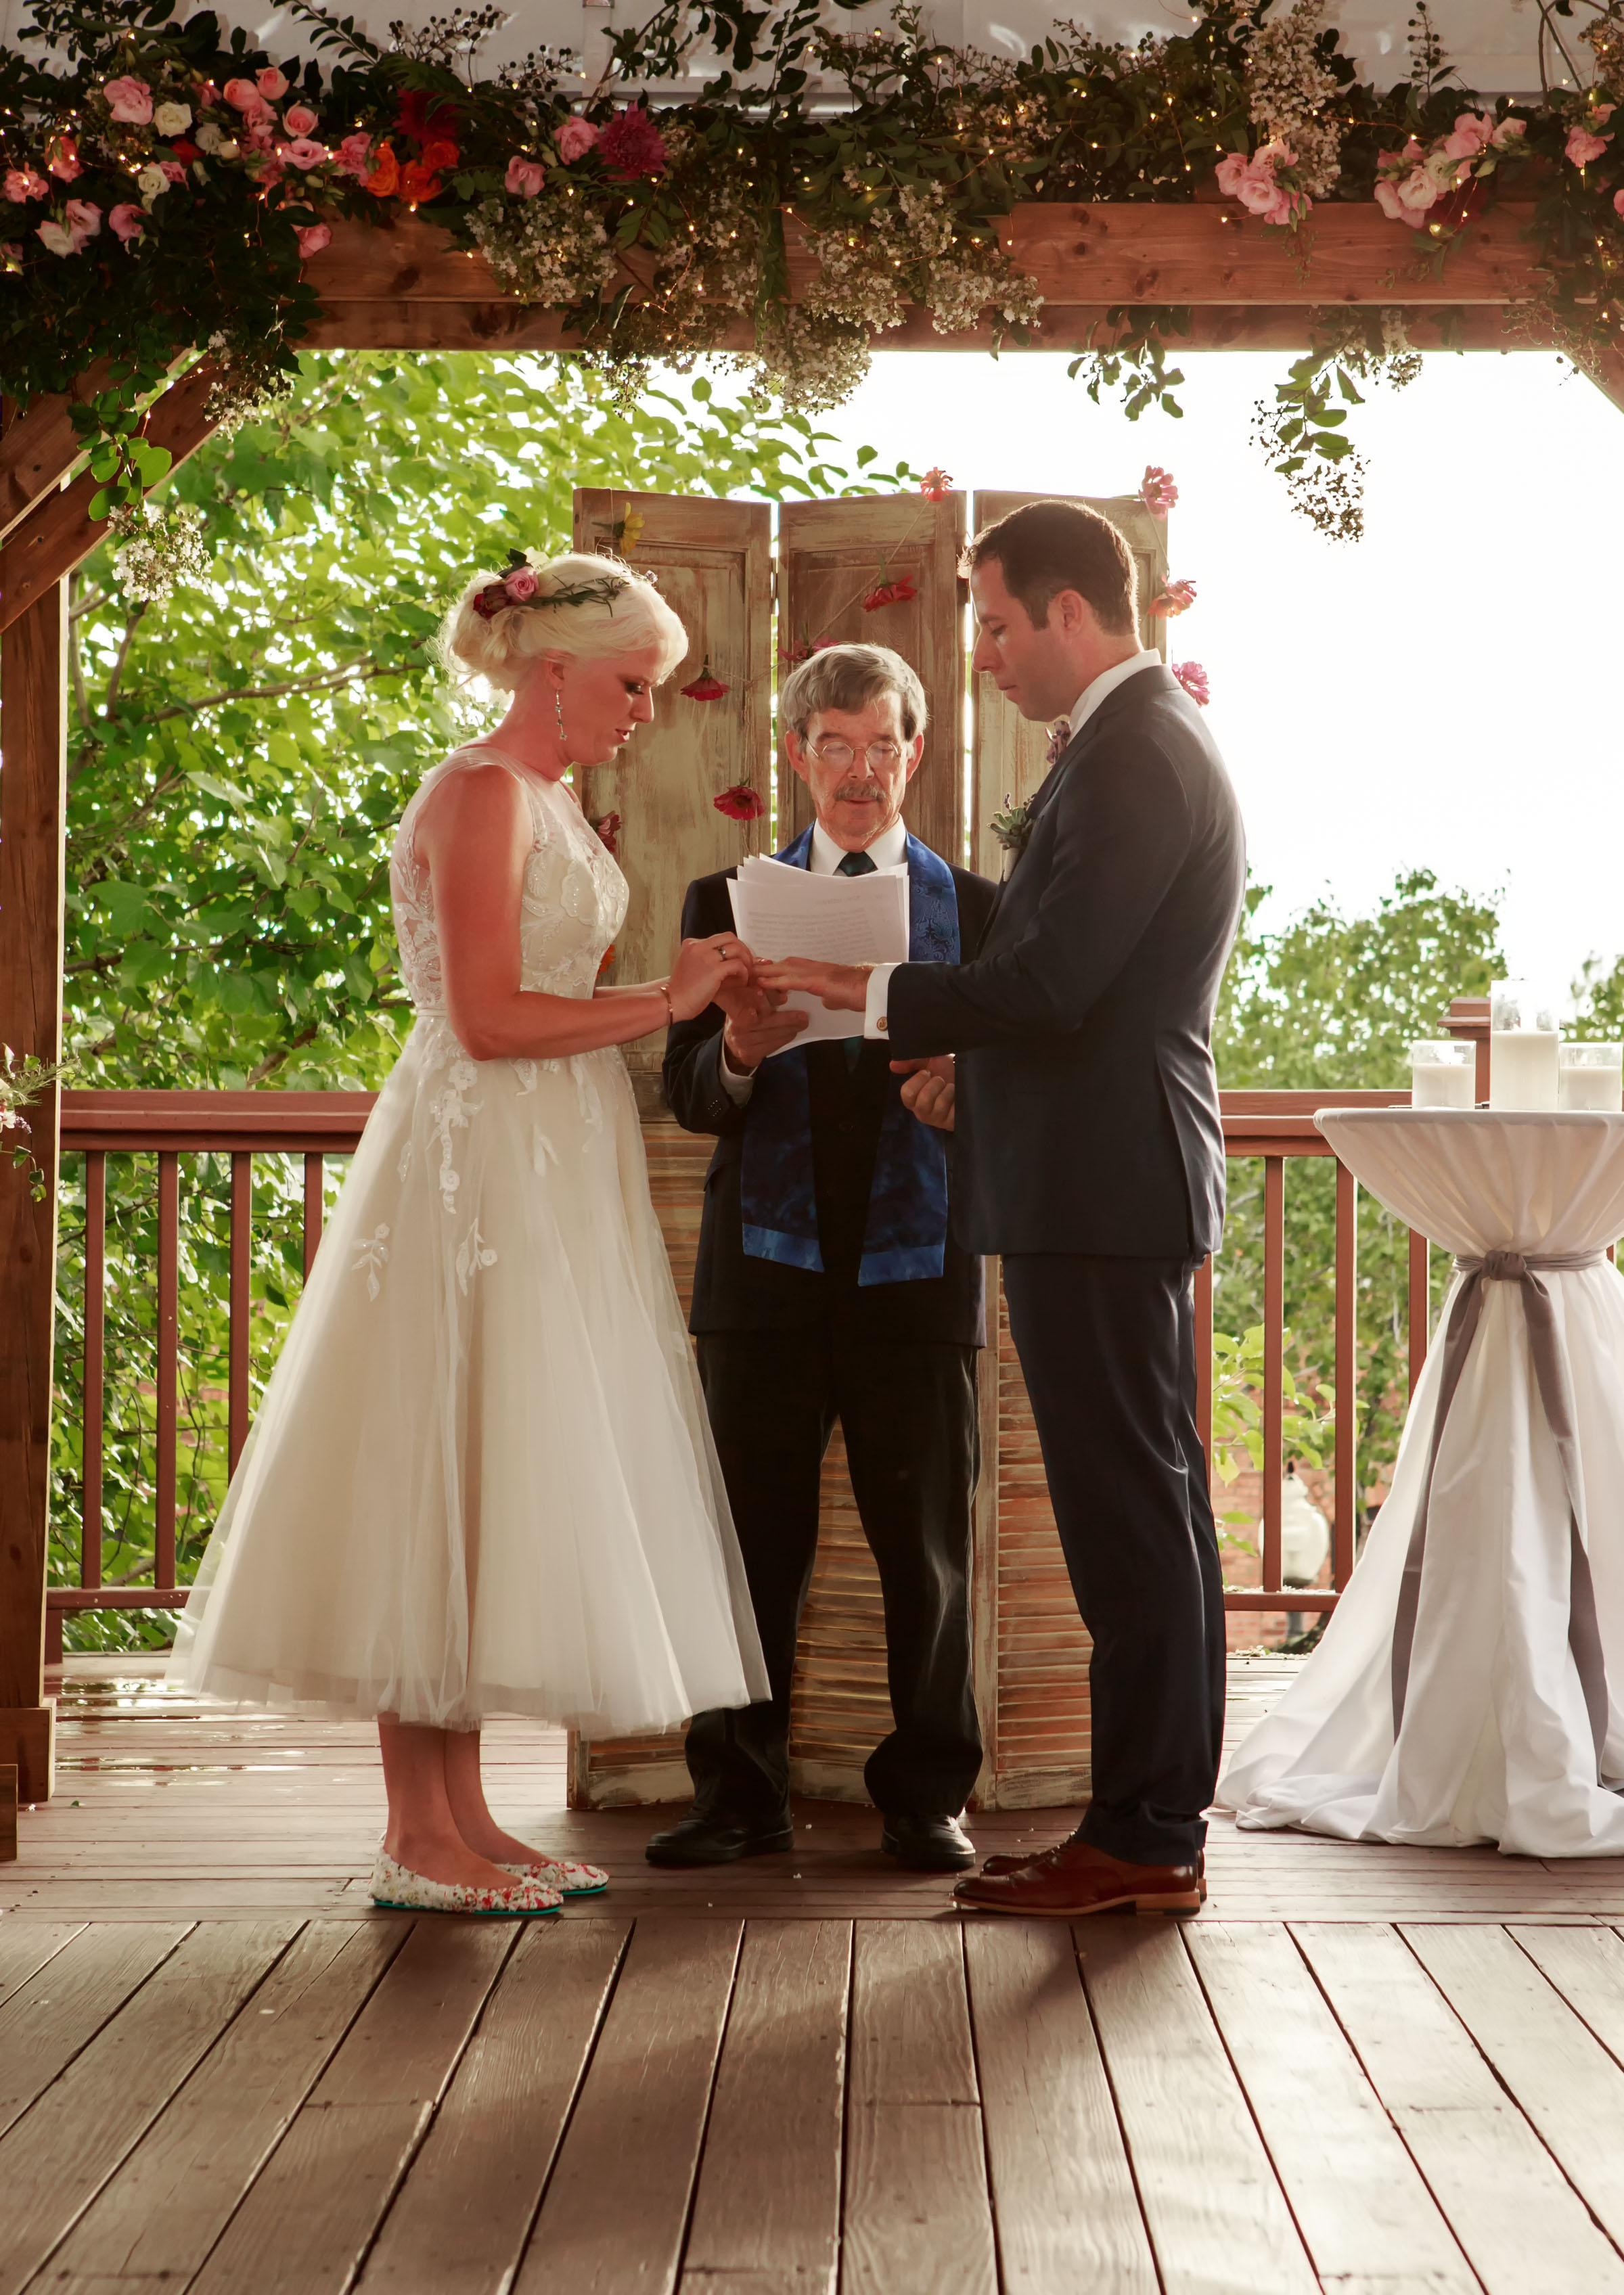 128-South-Wedding-Wilmington-NC-Photographer-Ceremony-22.1.jpg